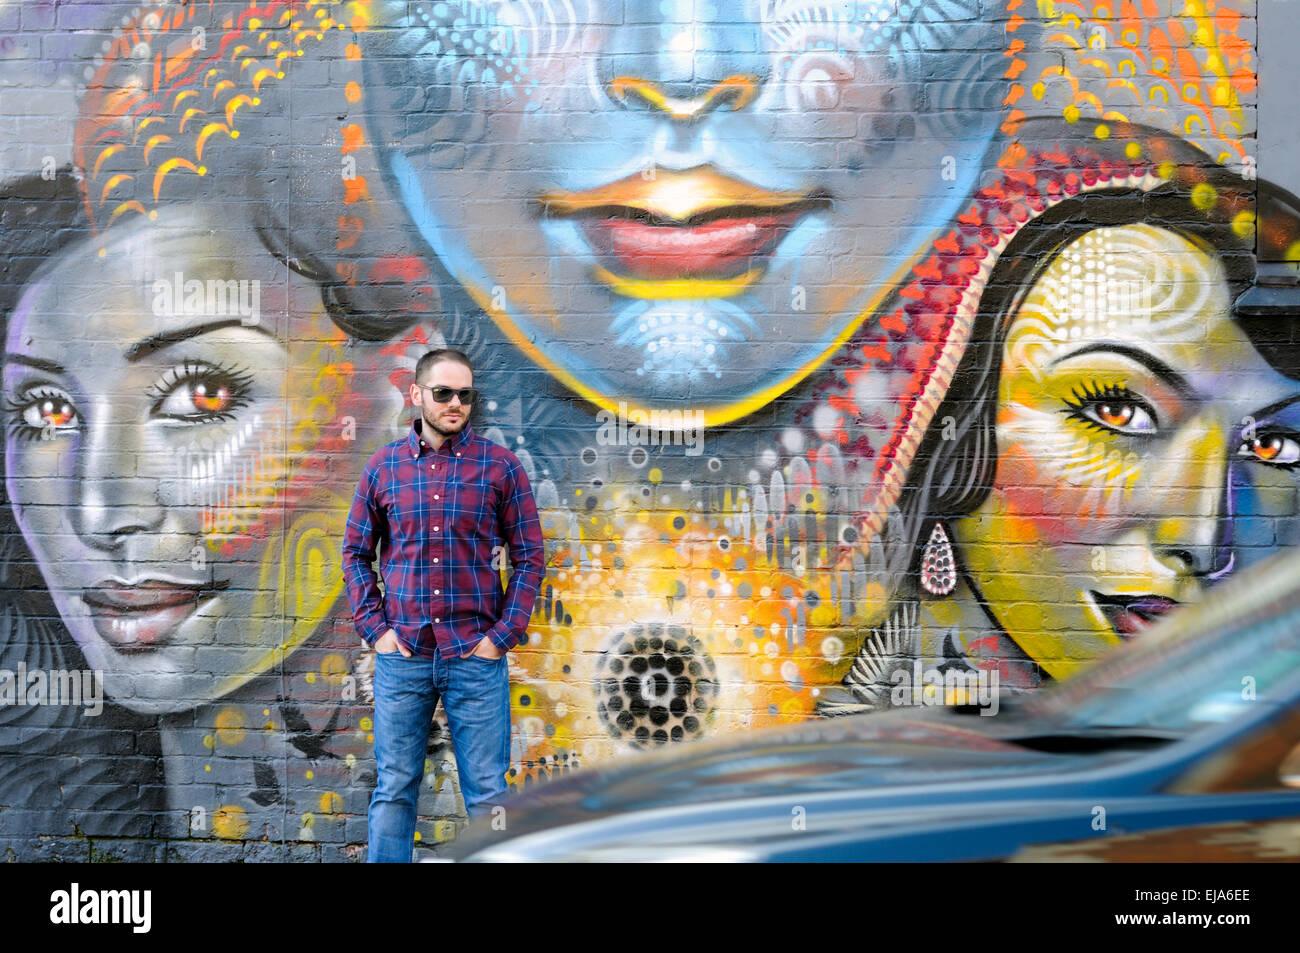 Graffiti wall uk - Leicester Man Standing Against Graffiti Wall Uk Stock Image